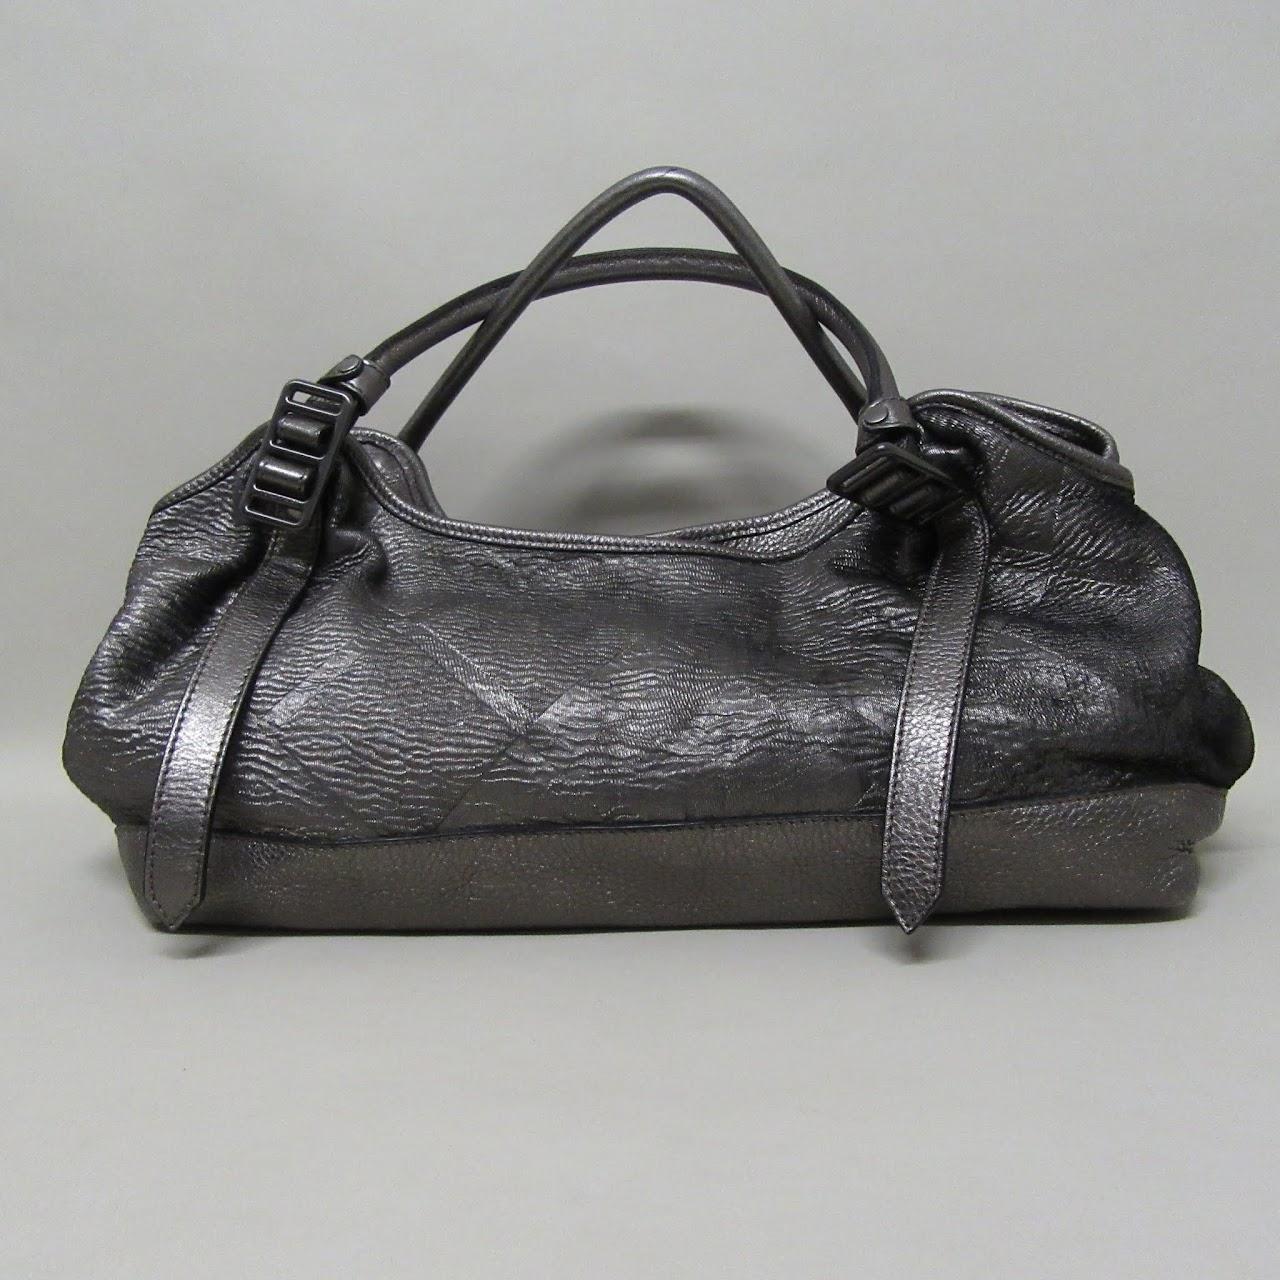 def11a9dfc74 Burberry Metallic Bag